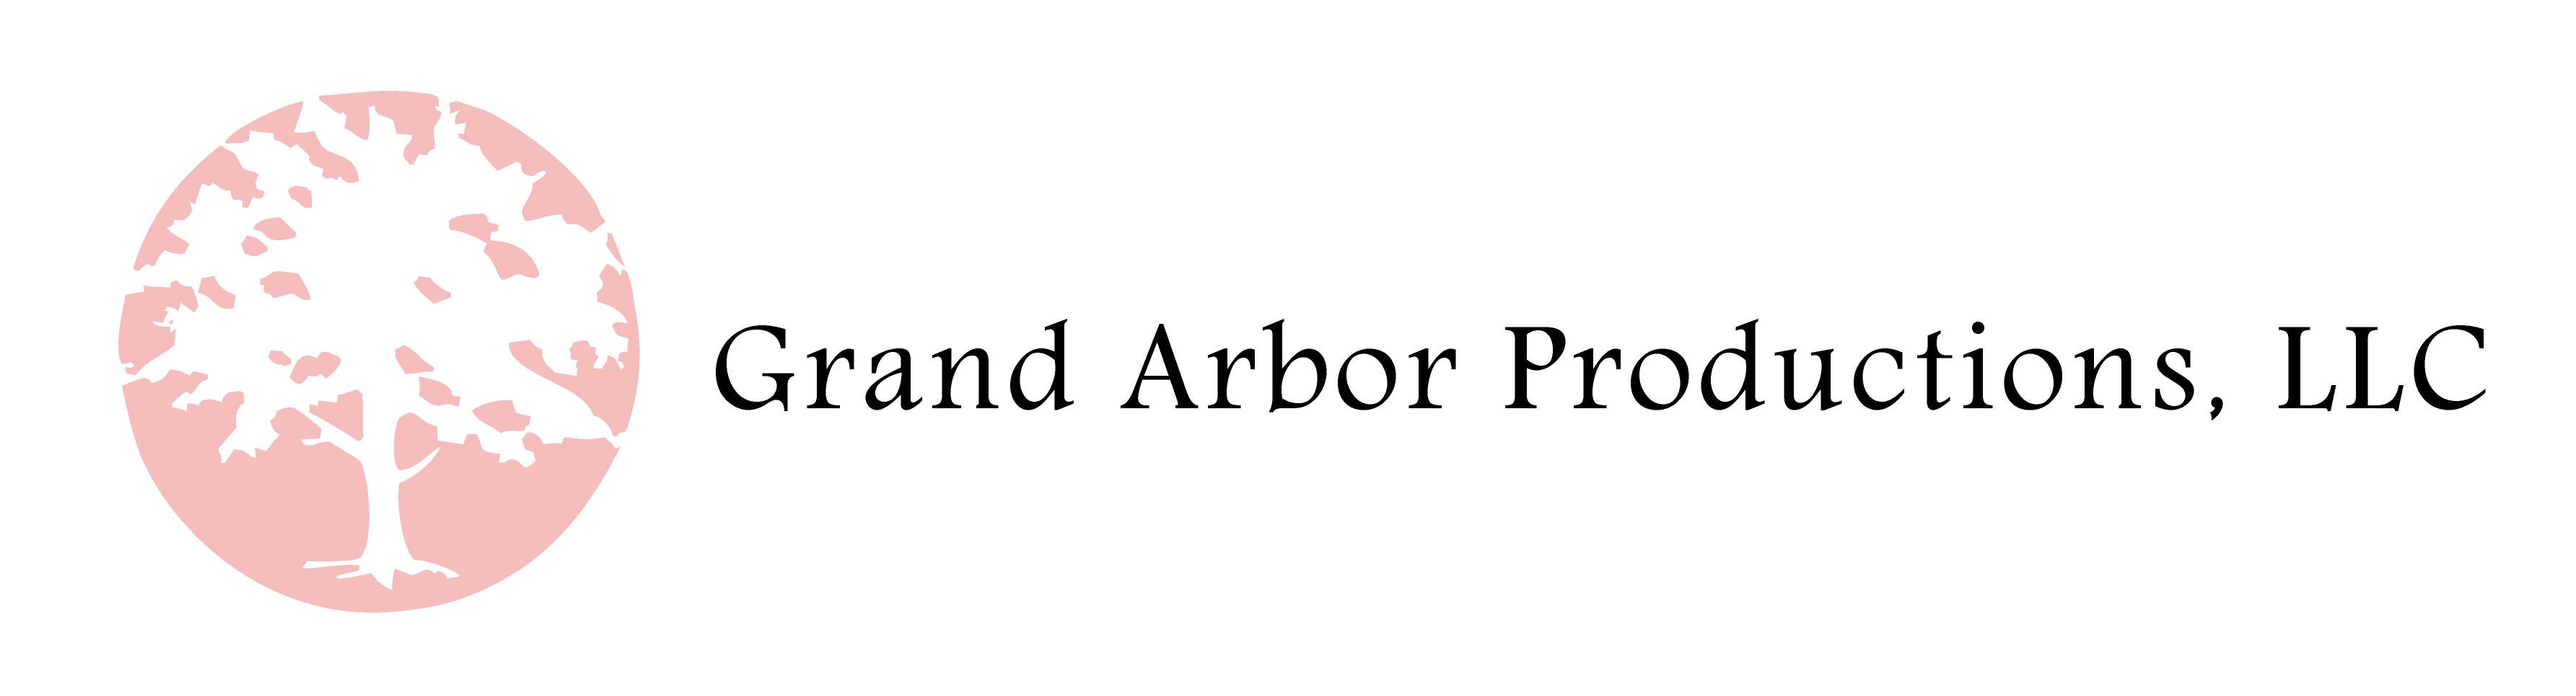 Grand Arbor Productions, LLC